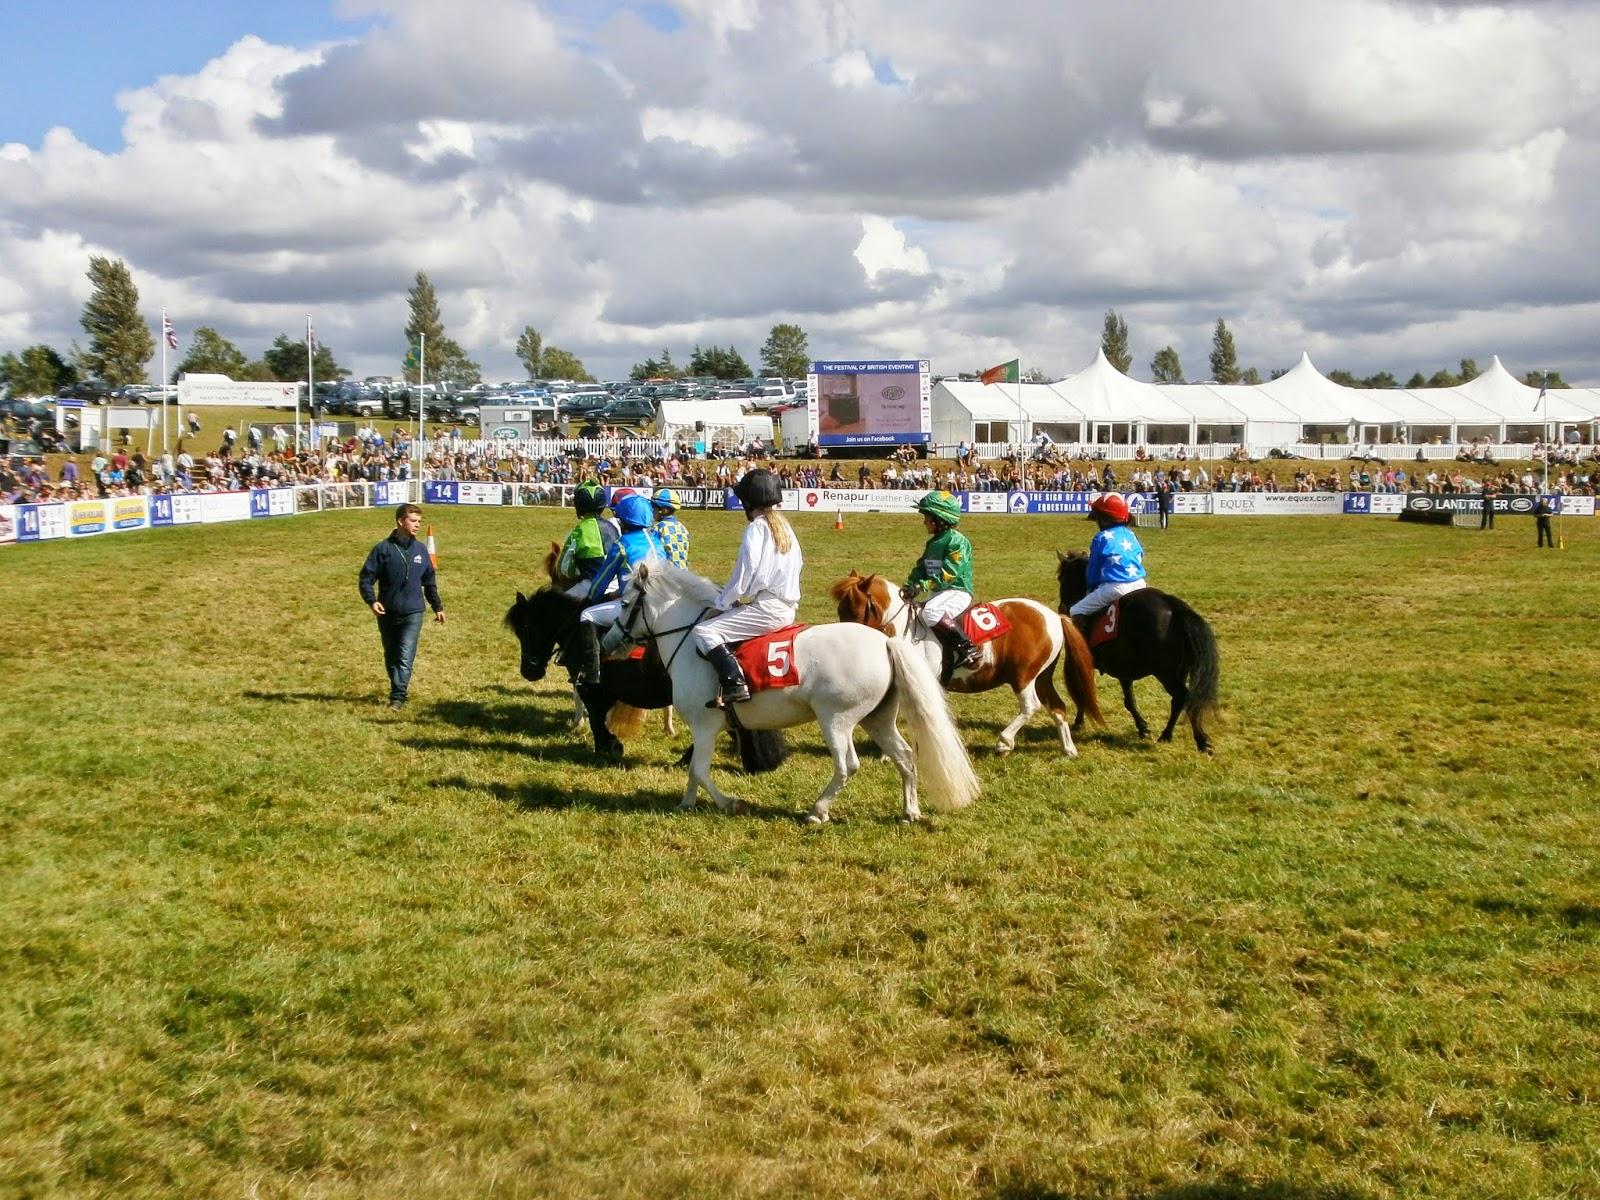 Shetland Pony Racing at Gatcombe Park